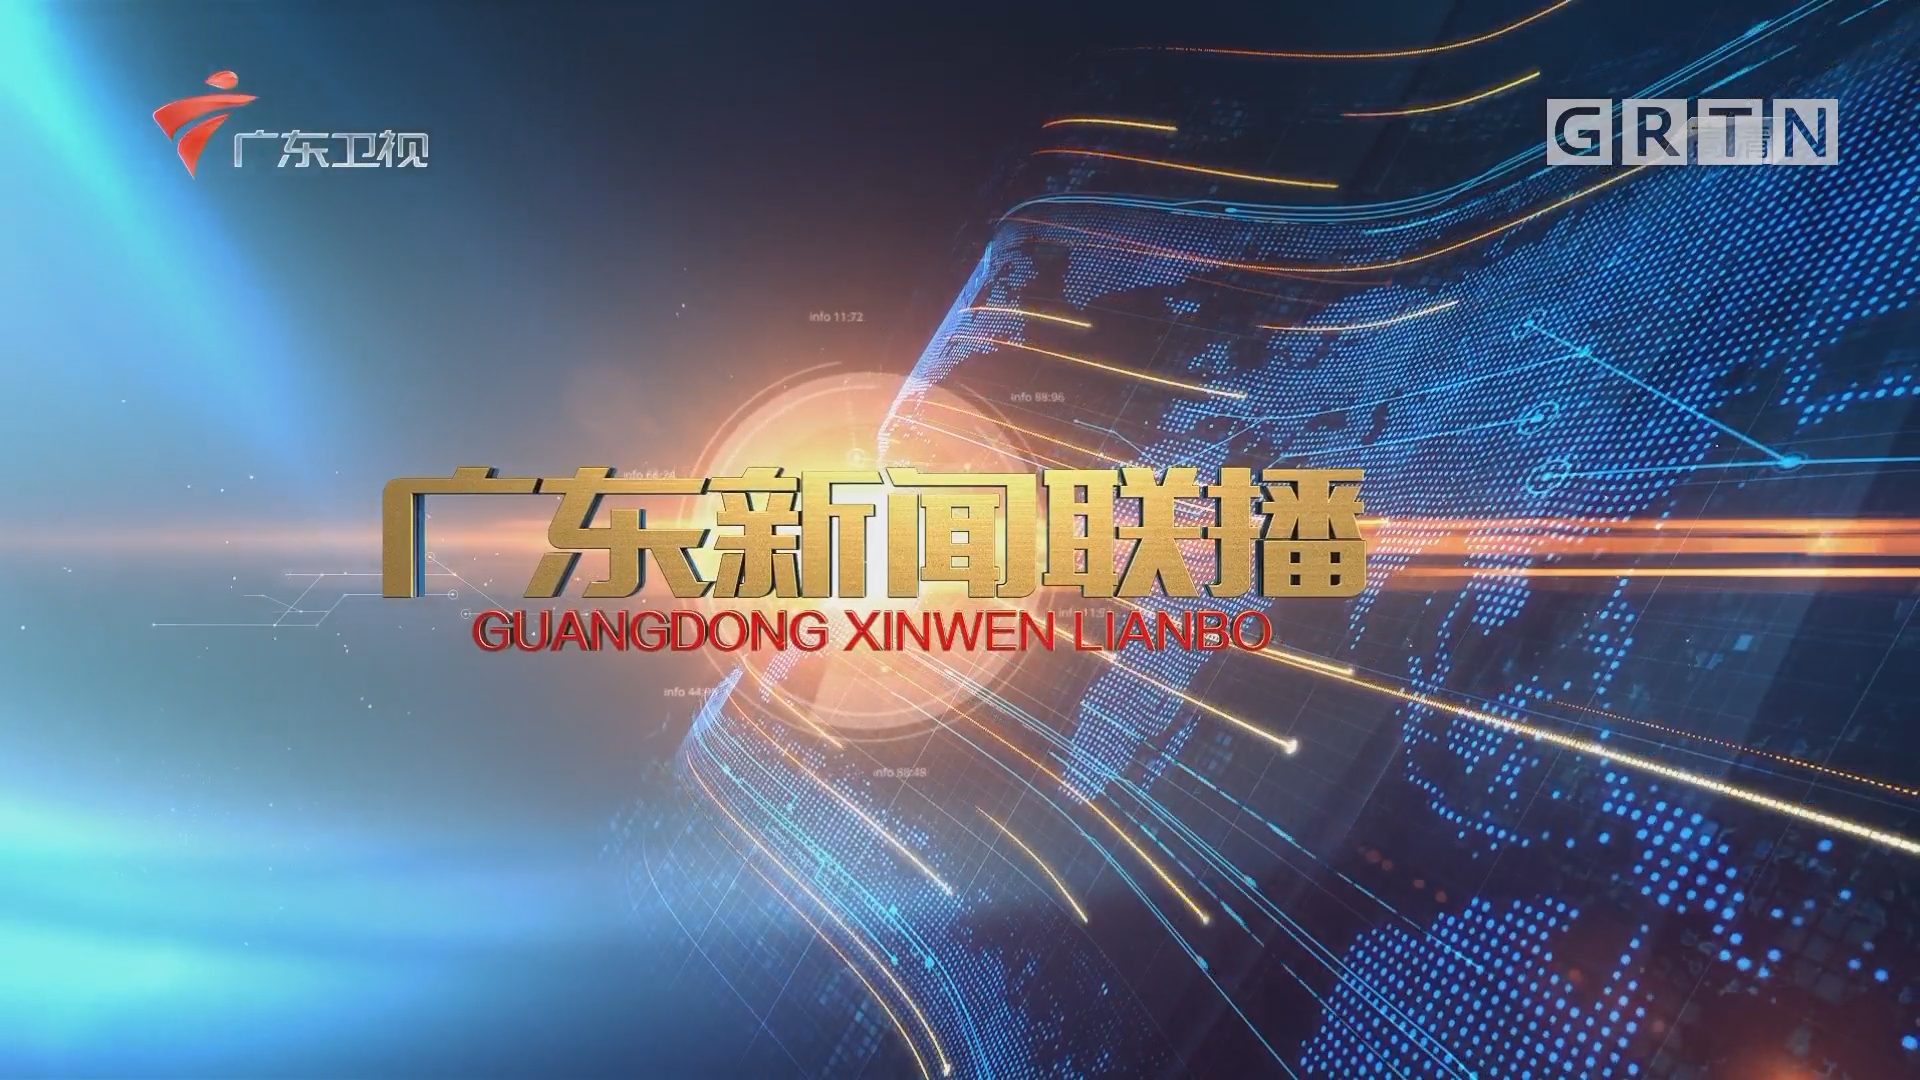 [HD][2018-12-18]广东新闻联播:庆祝改革开放40周年大会在京隆重举行